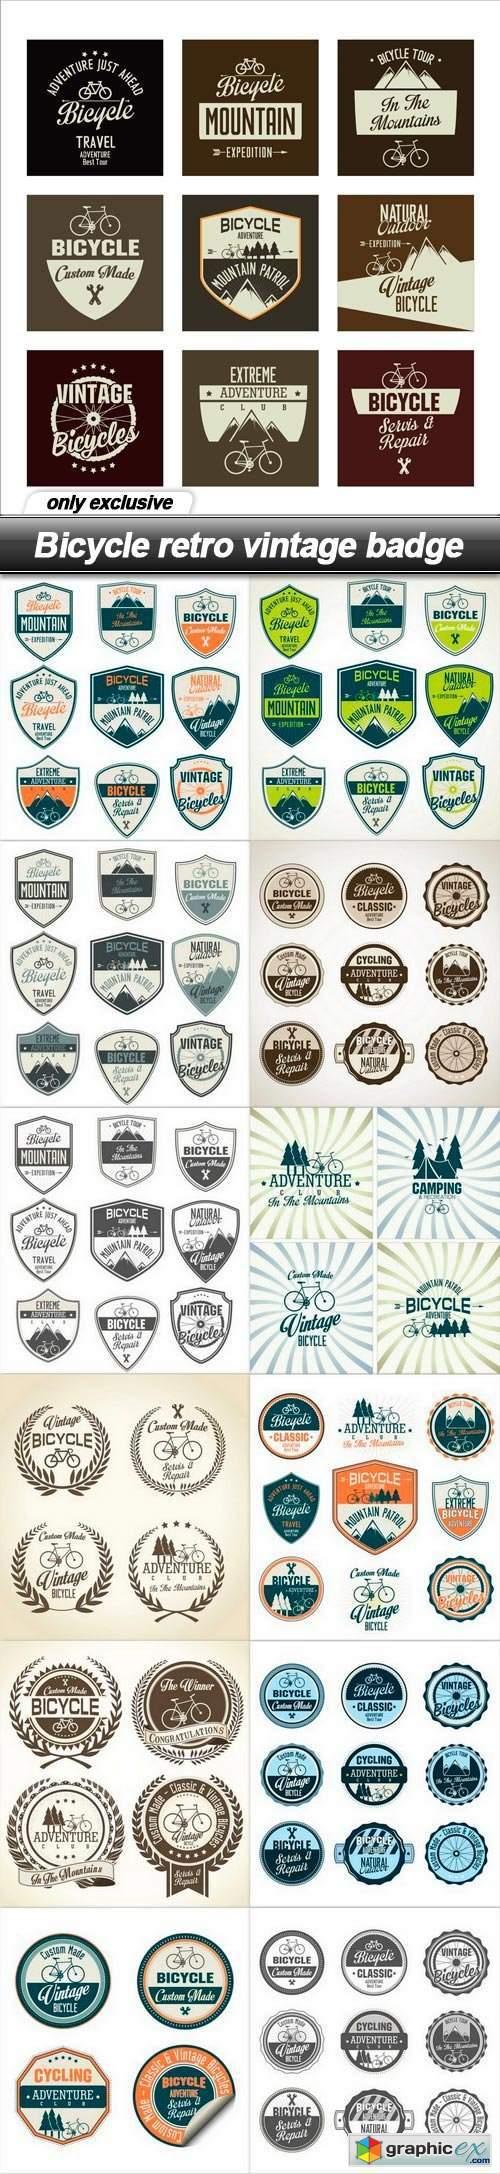 Bicycle retro vintage badge - 13 EPS